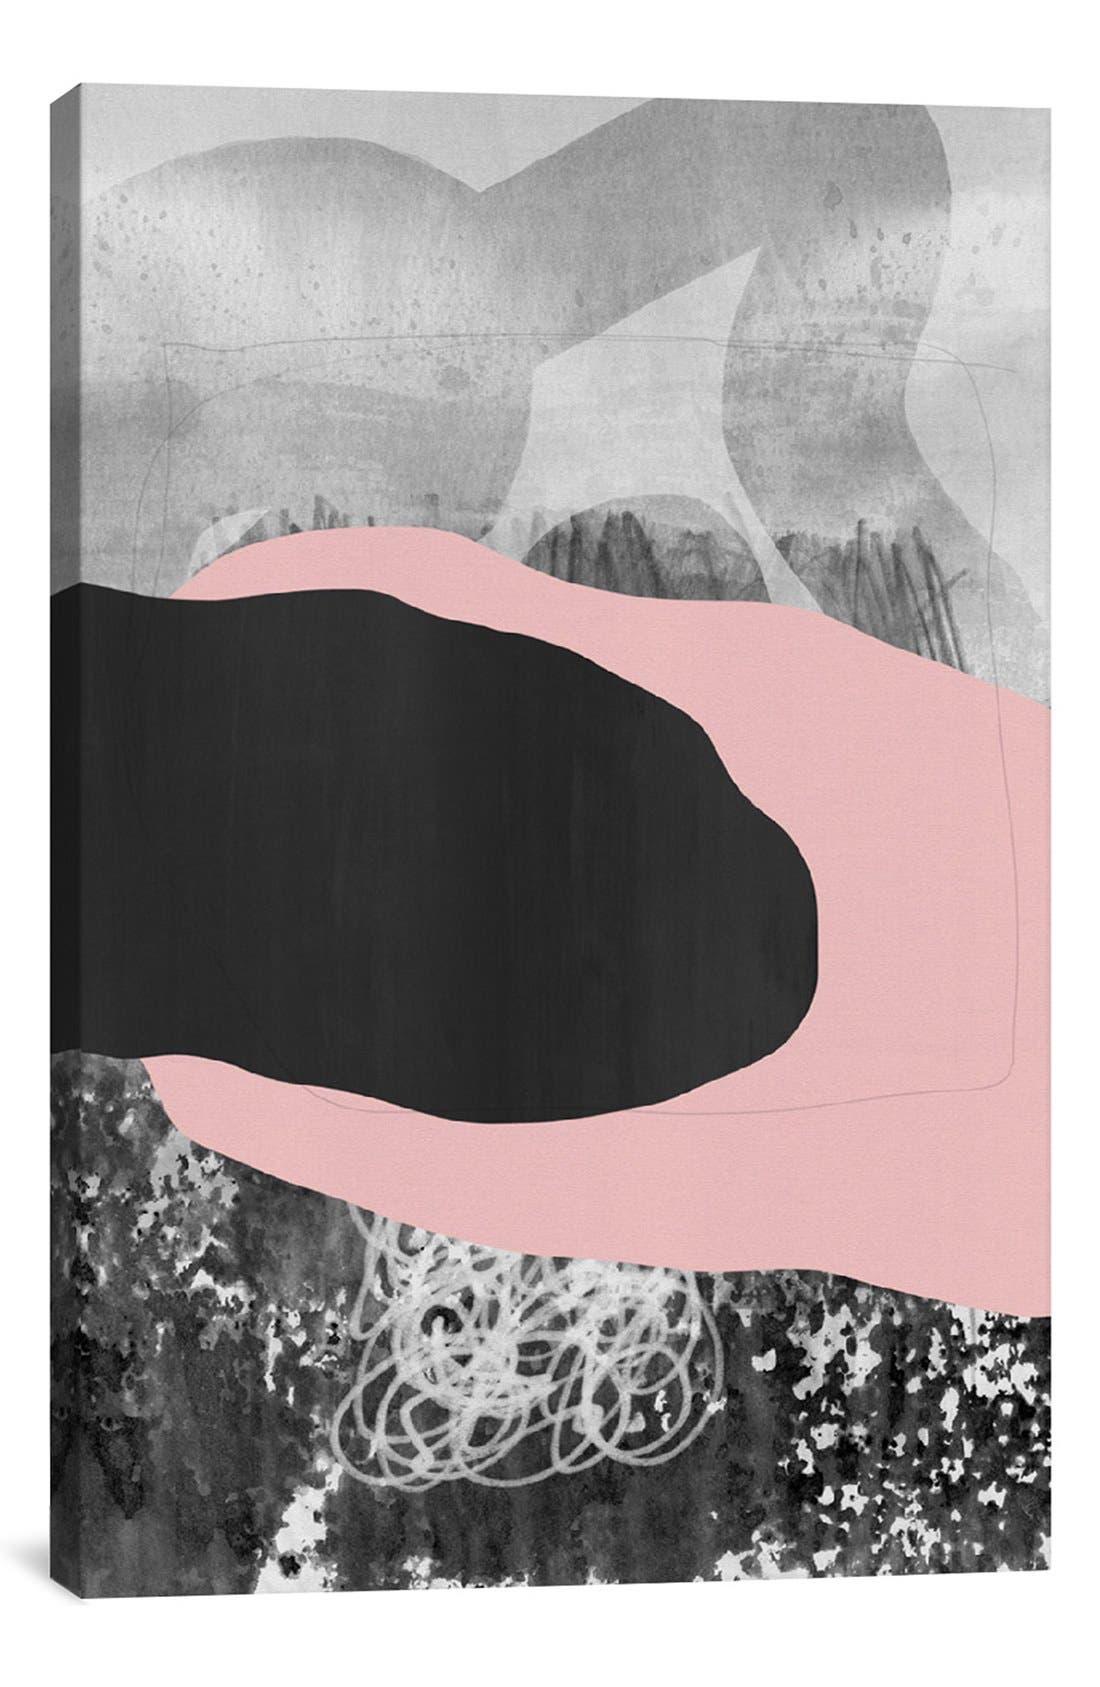 Alternate Image 1 Selected - iCanvas 'Drink a Toast - Federico Saenz Recio' Giclée Print Canvas Art